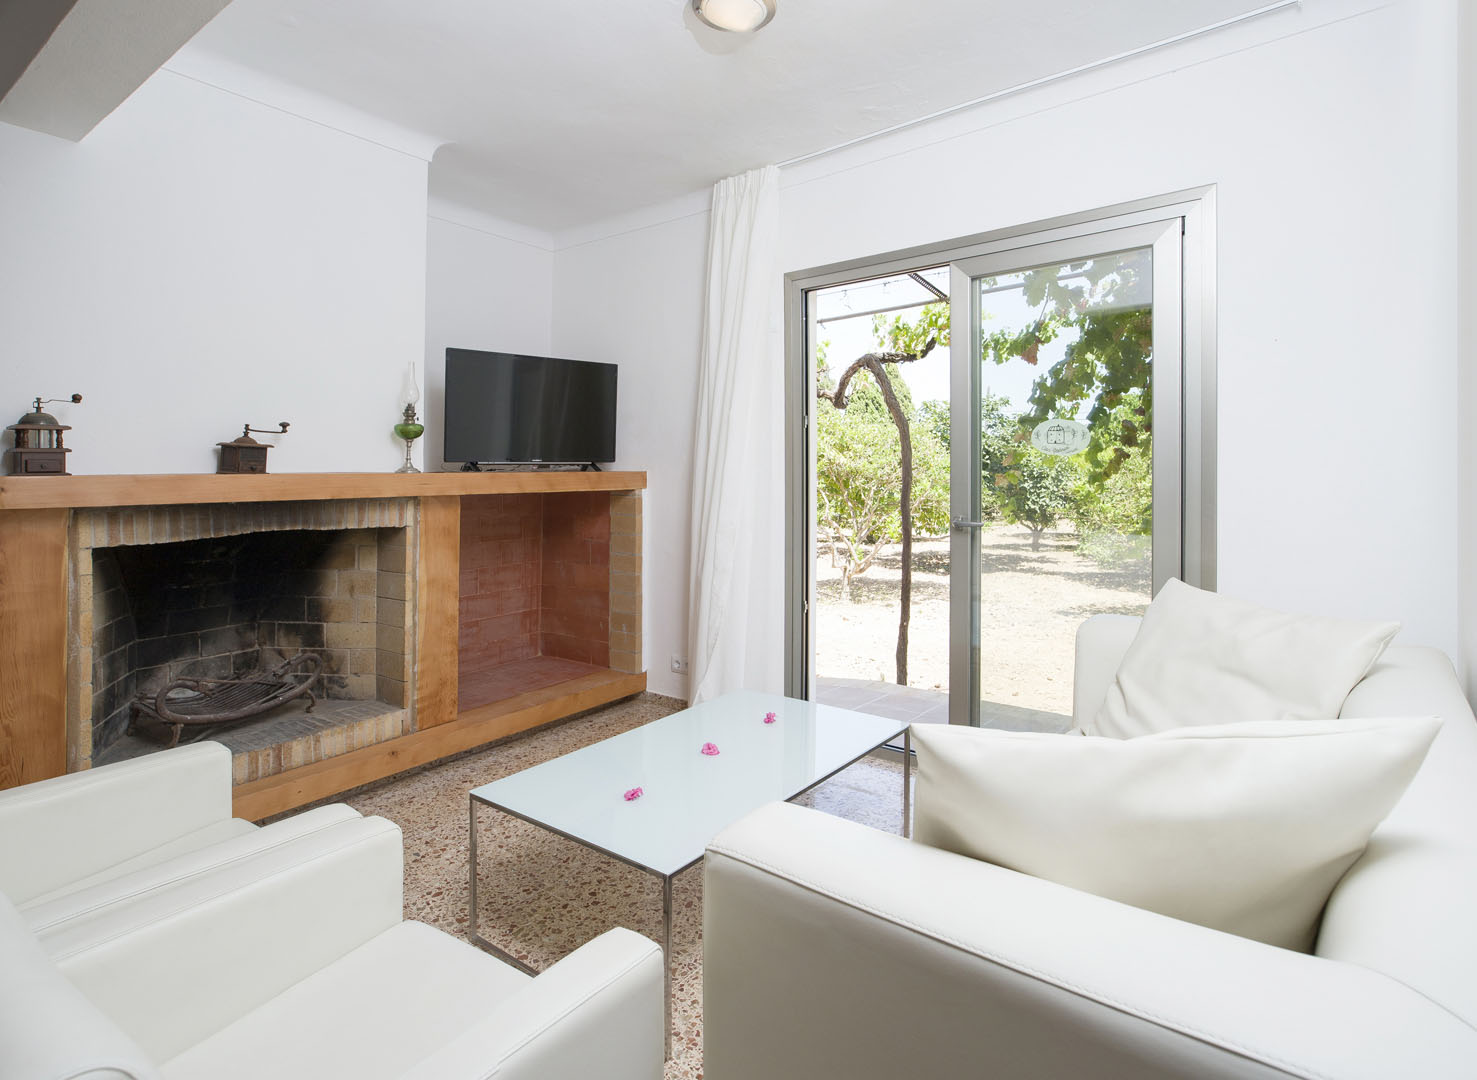 https://www.apartamentosbonsol-ibiza.com/wp-content/uploads/2019/02/08.jpg